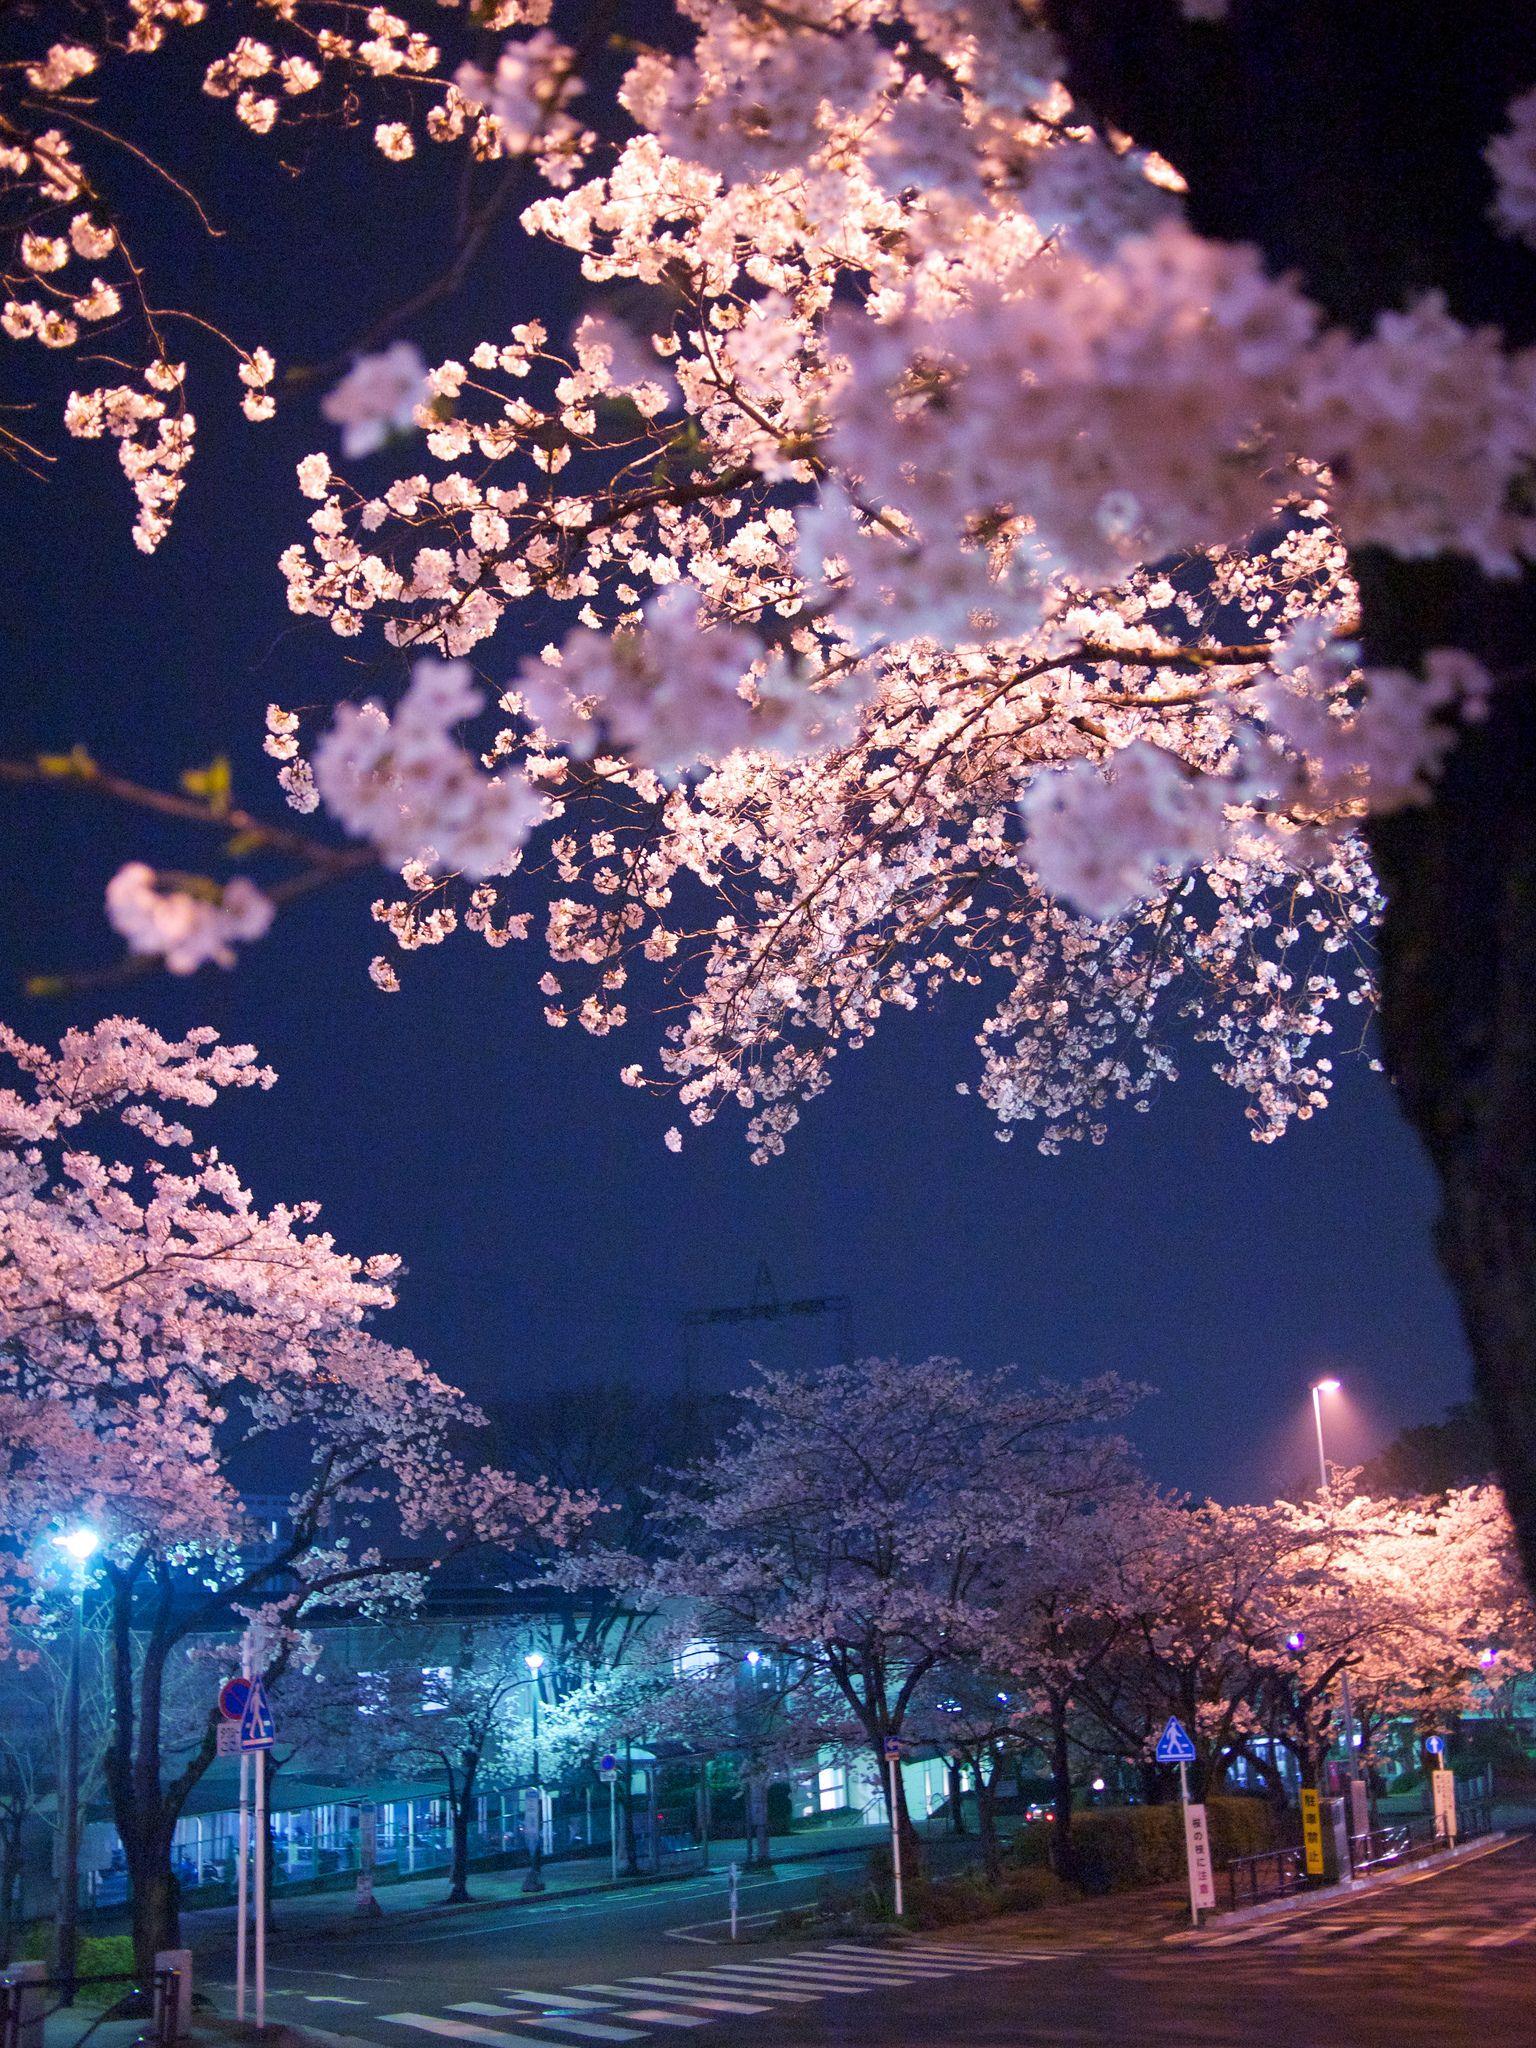 P3279201 Cherry blossom japan, Blossom trees, Sakura